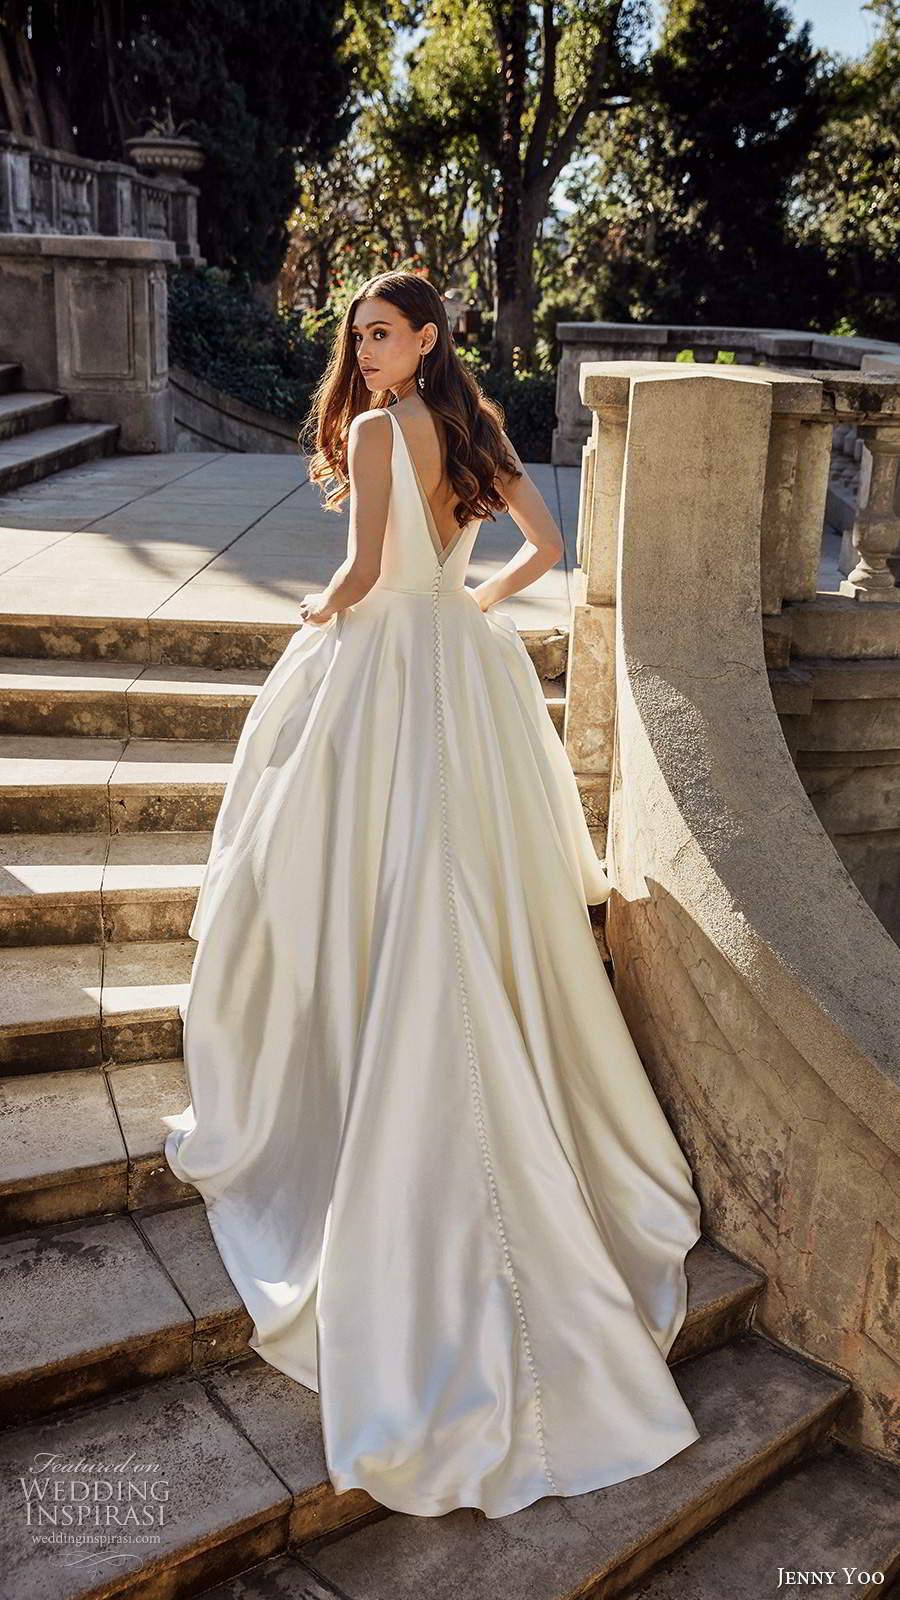 jenny yoo spring 2020 bridal sleeeless straps v neckline minimalist clean a line ball gown wedding dress v back chapel train (5) bv